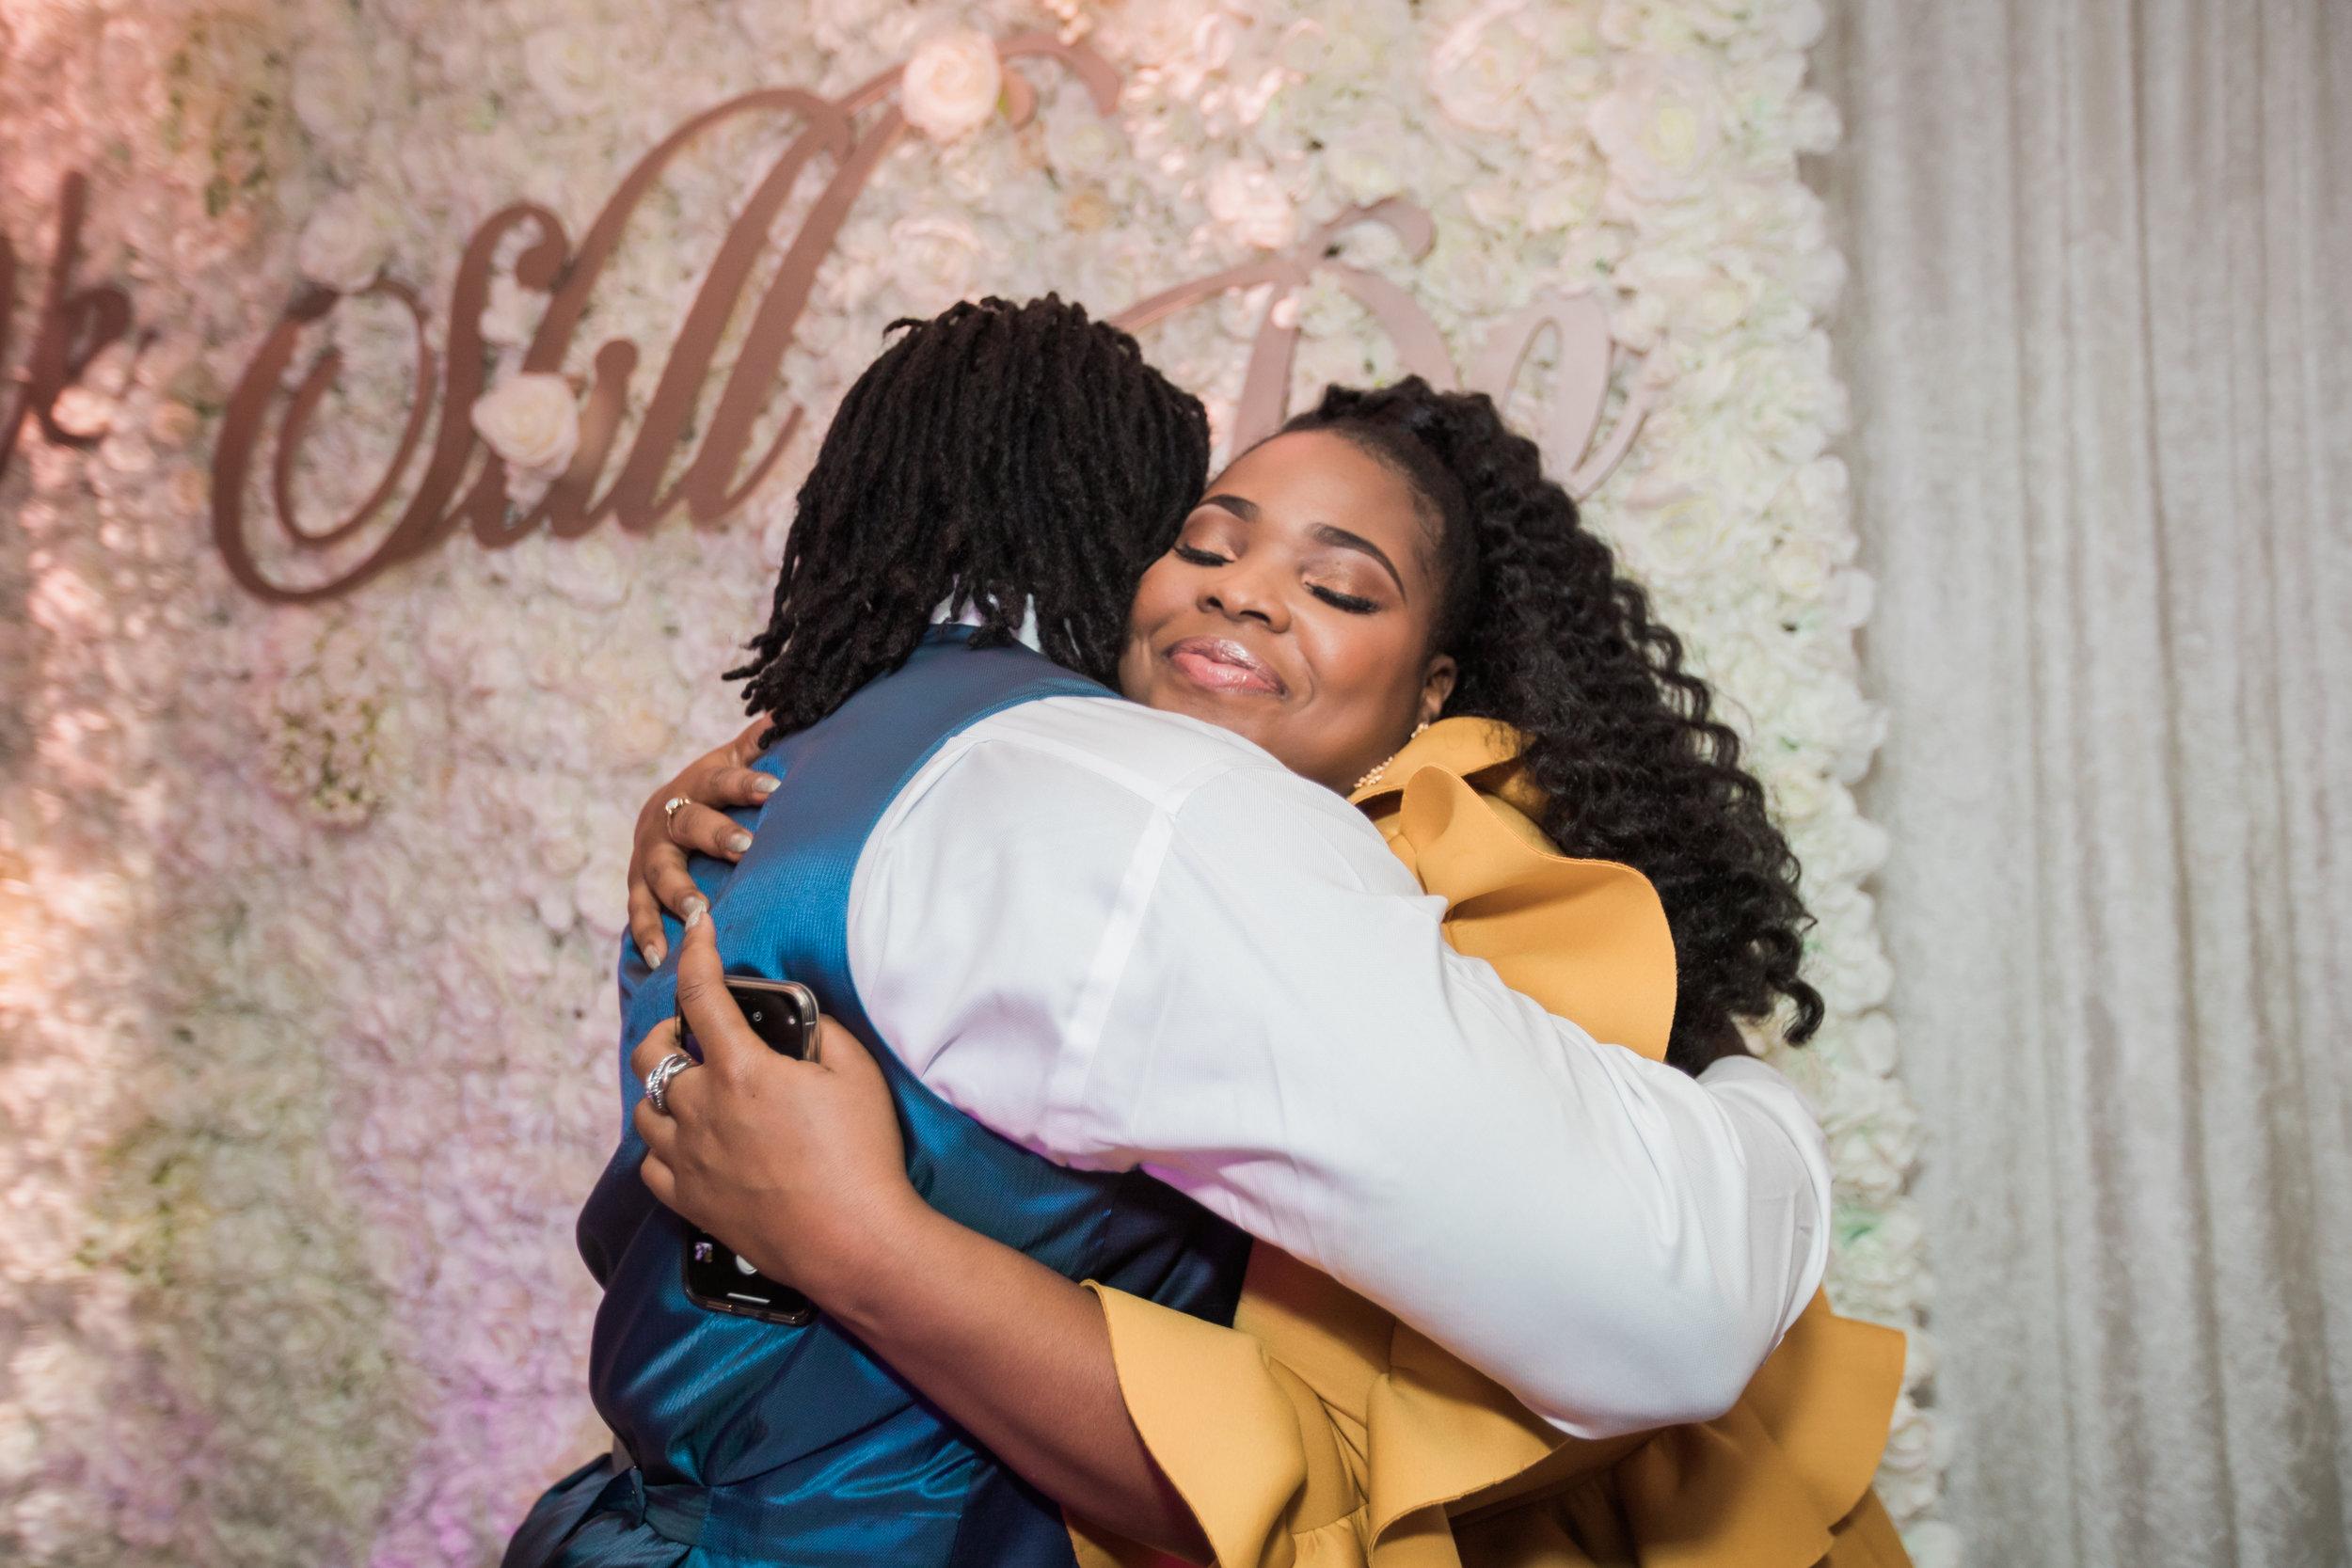 Baltimore City Wedding at Hotel Indigo Megapixels Media Photography Tira Lynn Events Black Bride and Groom (55 of 74).jpg